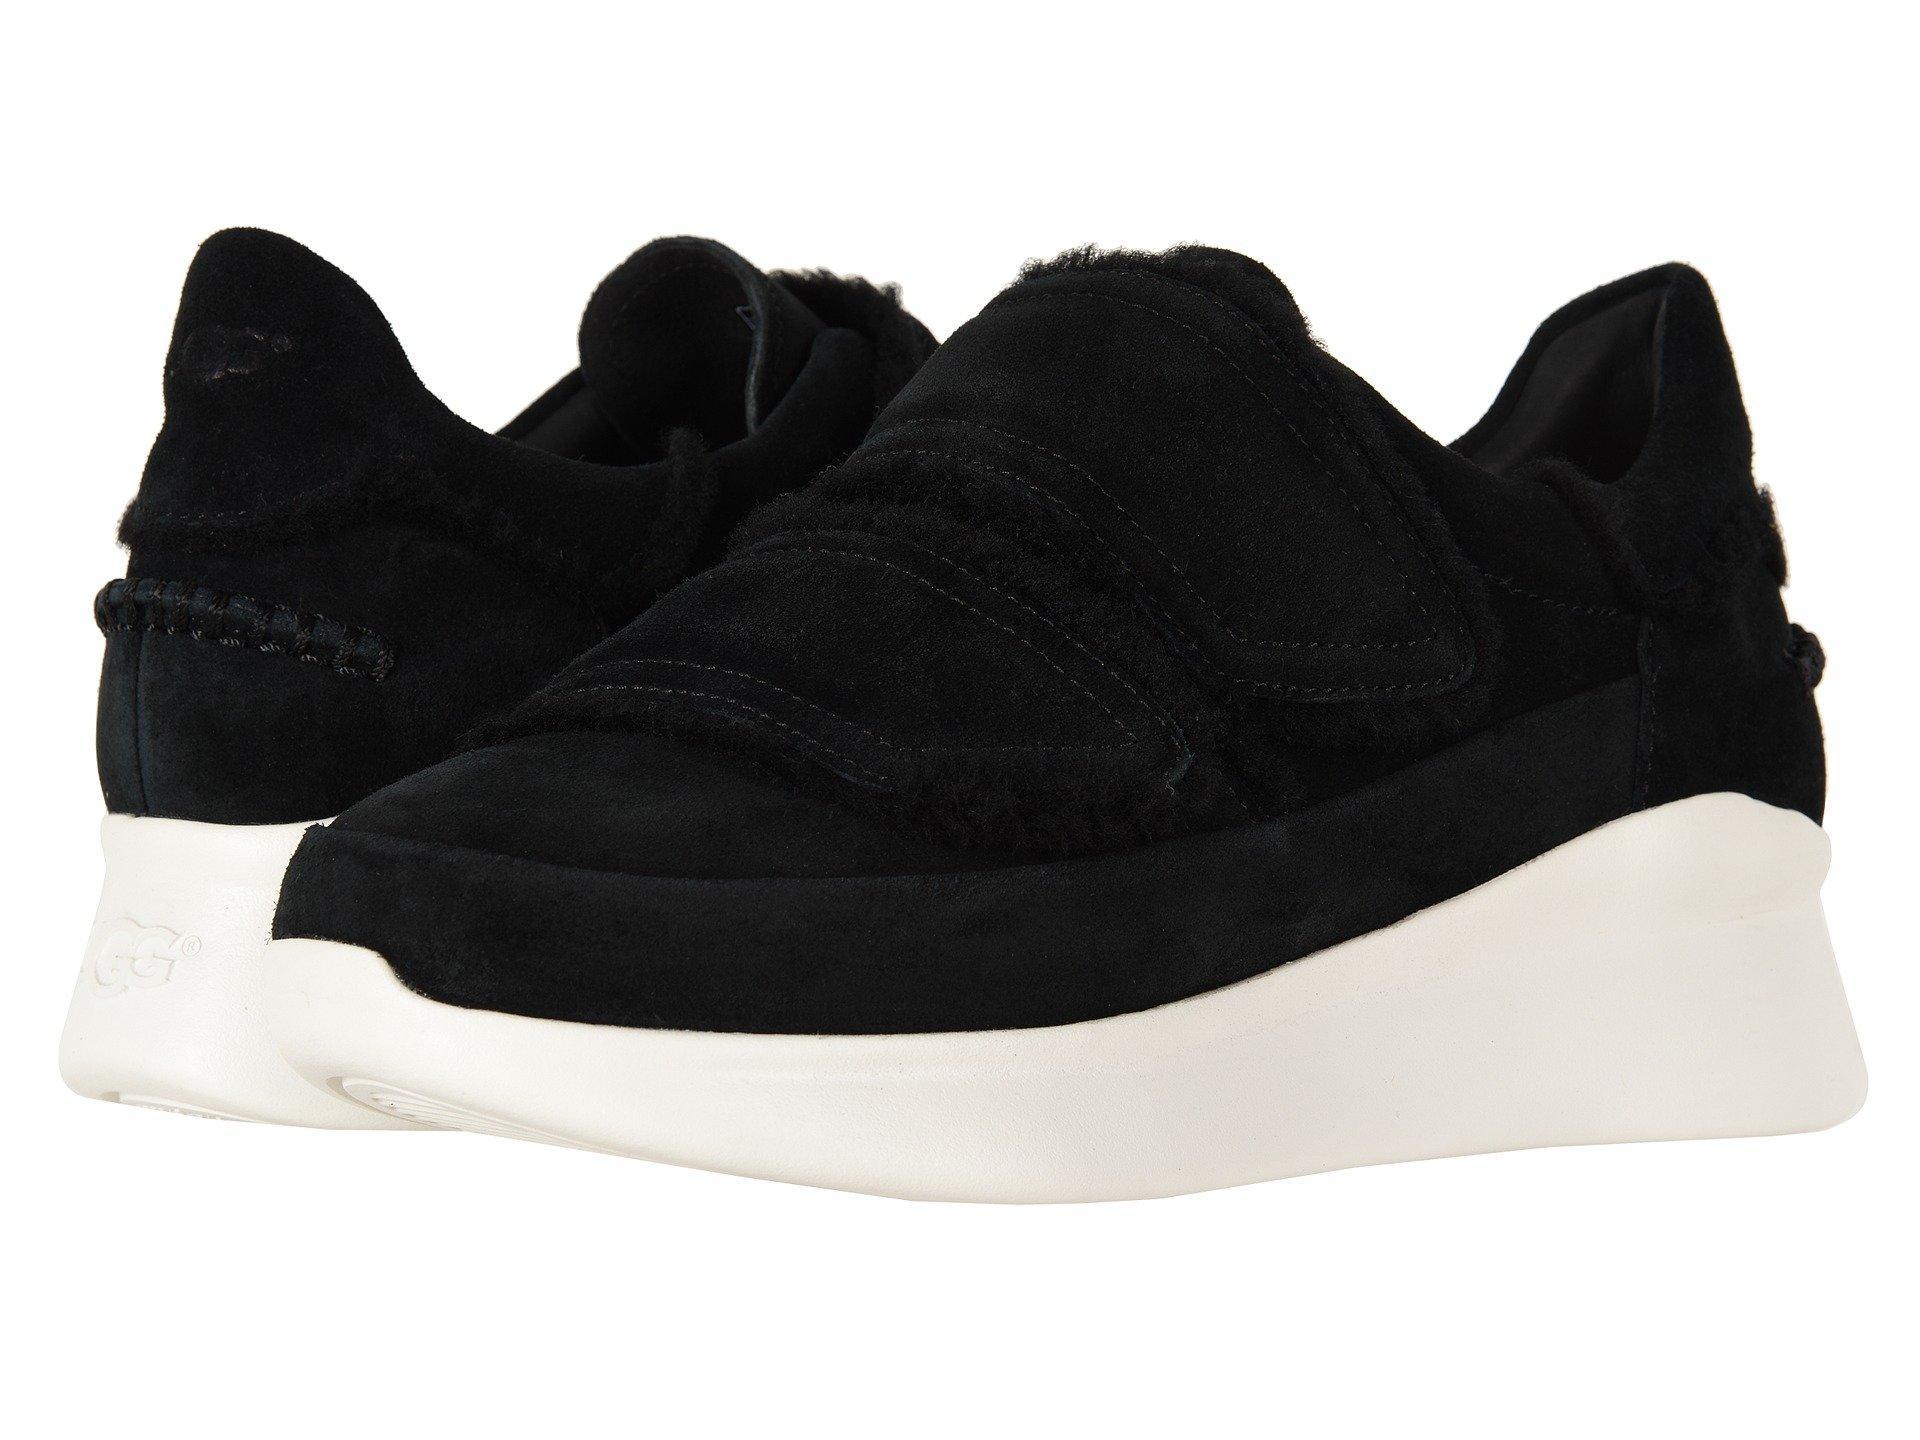 3f73fc7d341 Lyst - UGG Ashby Spill Seam Sneaker in Black